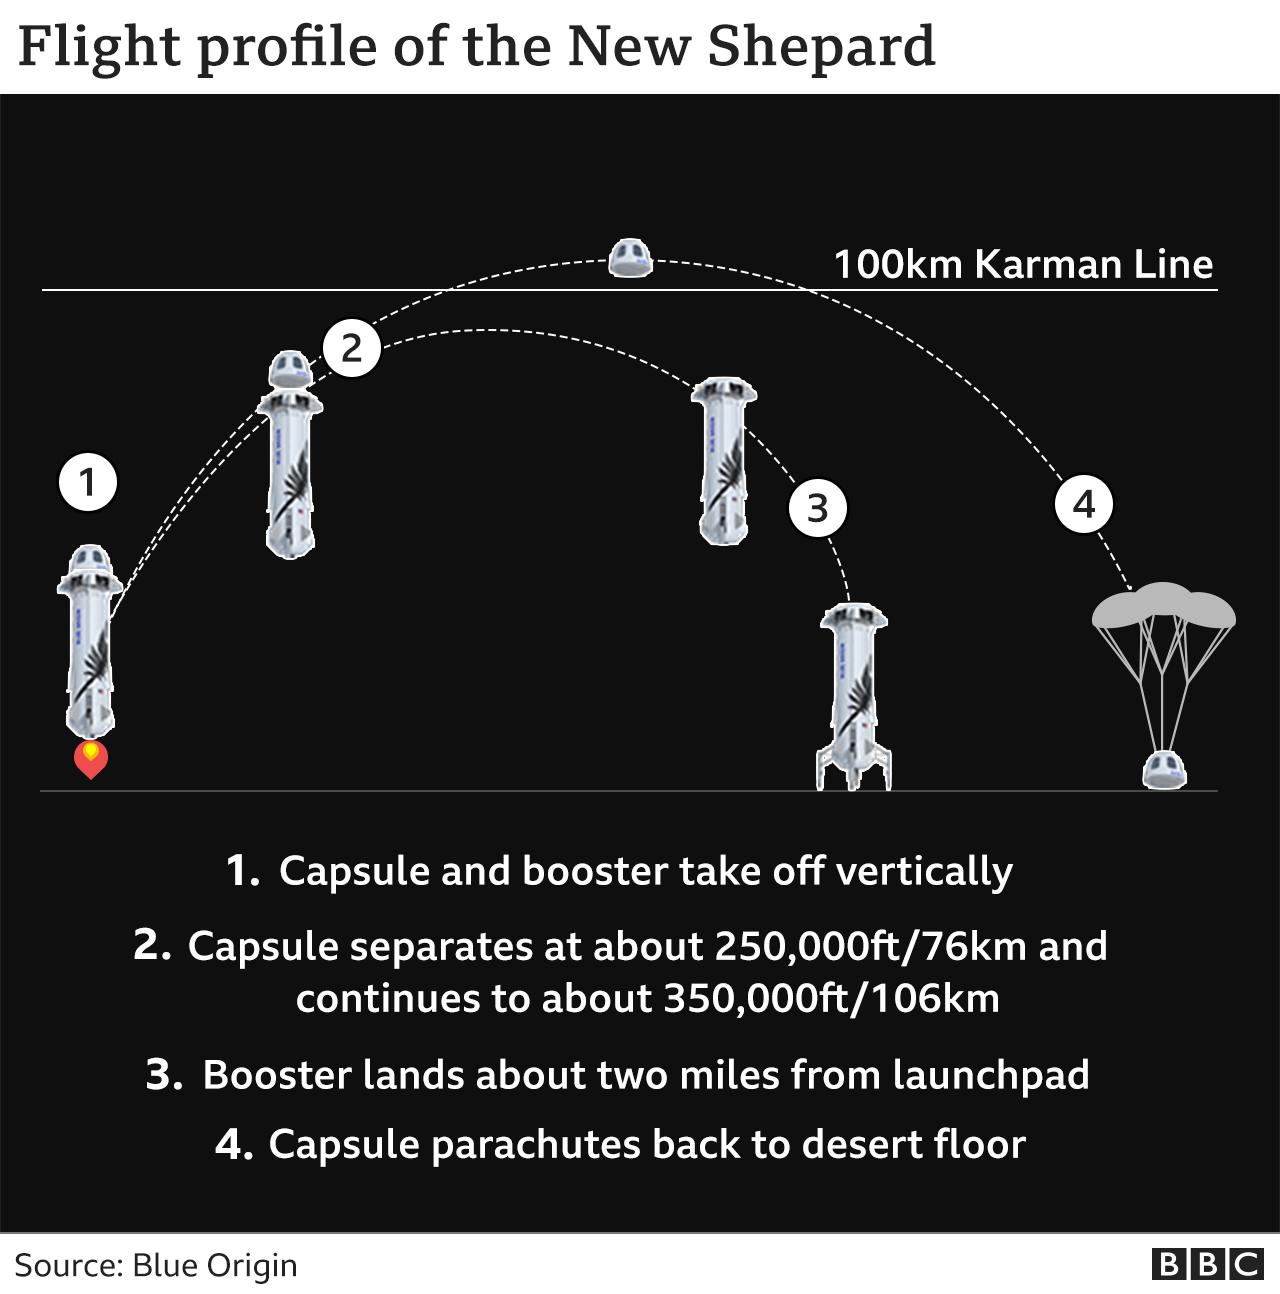 New Shepard